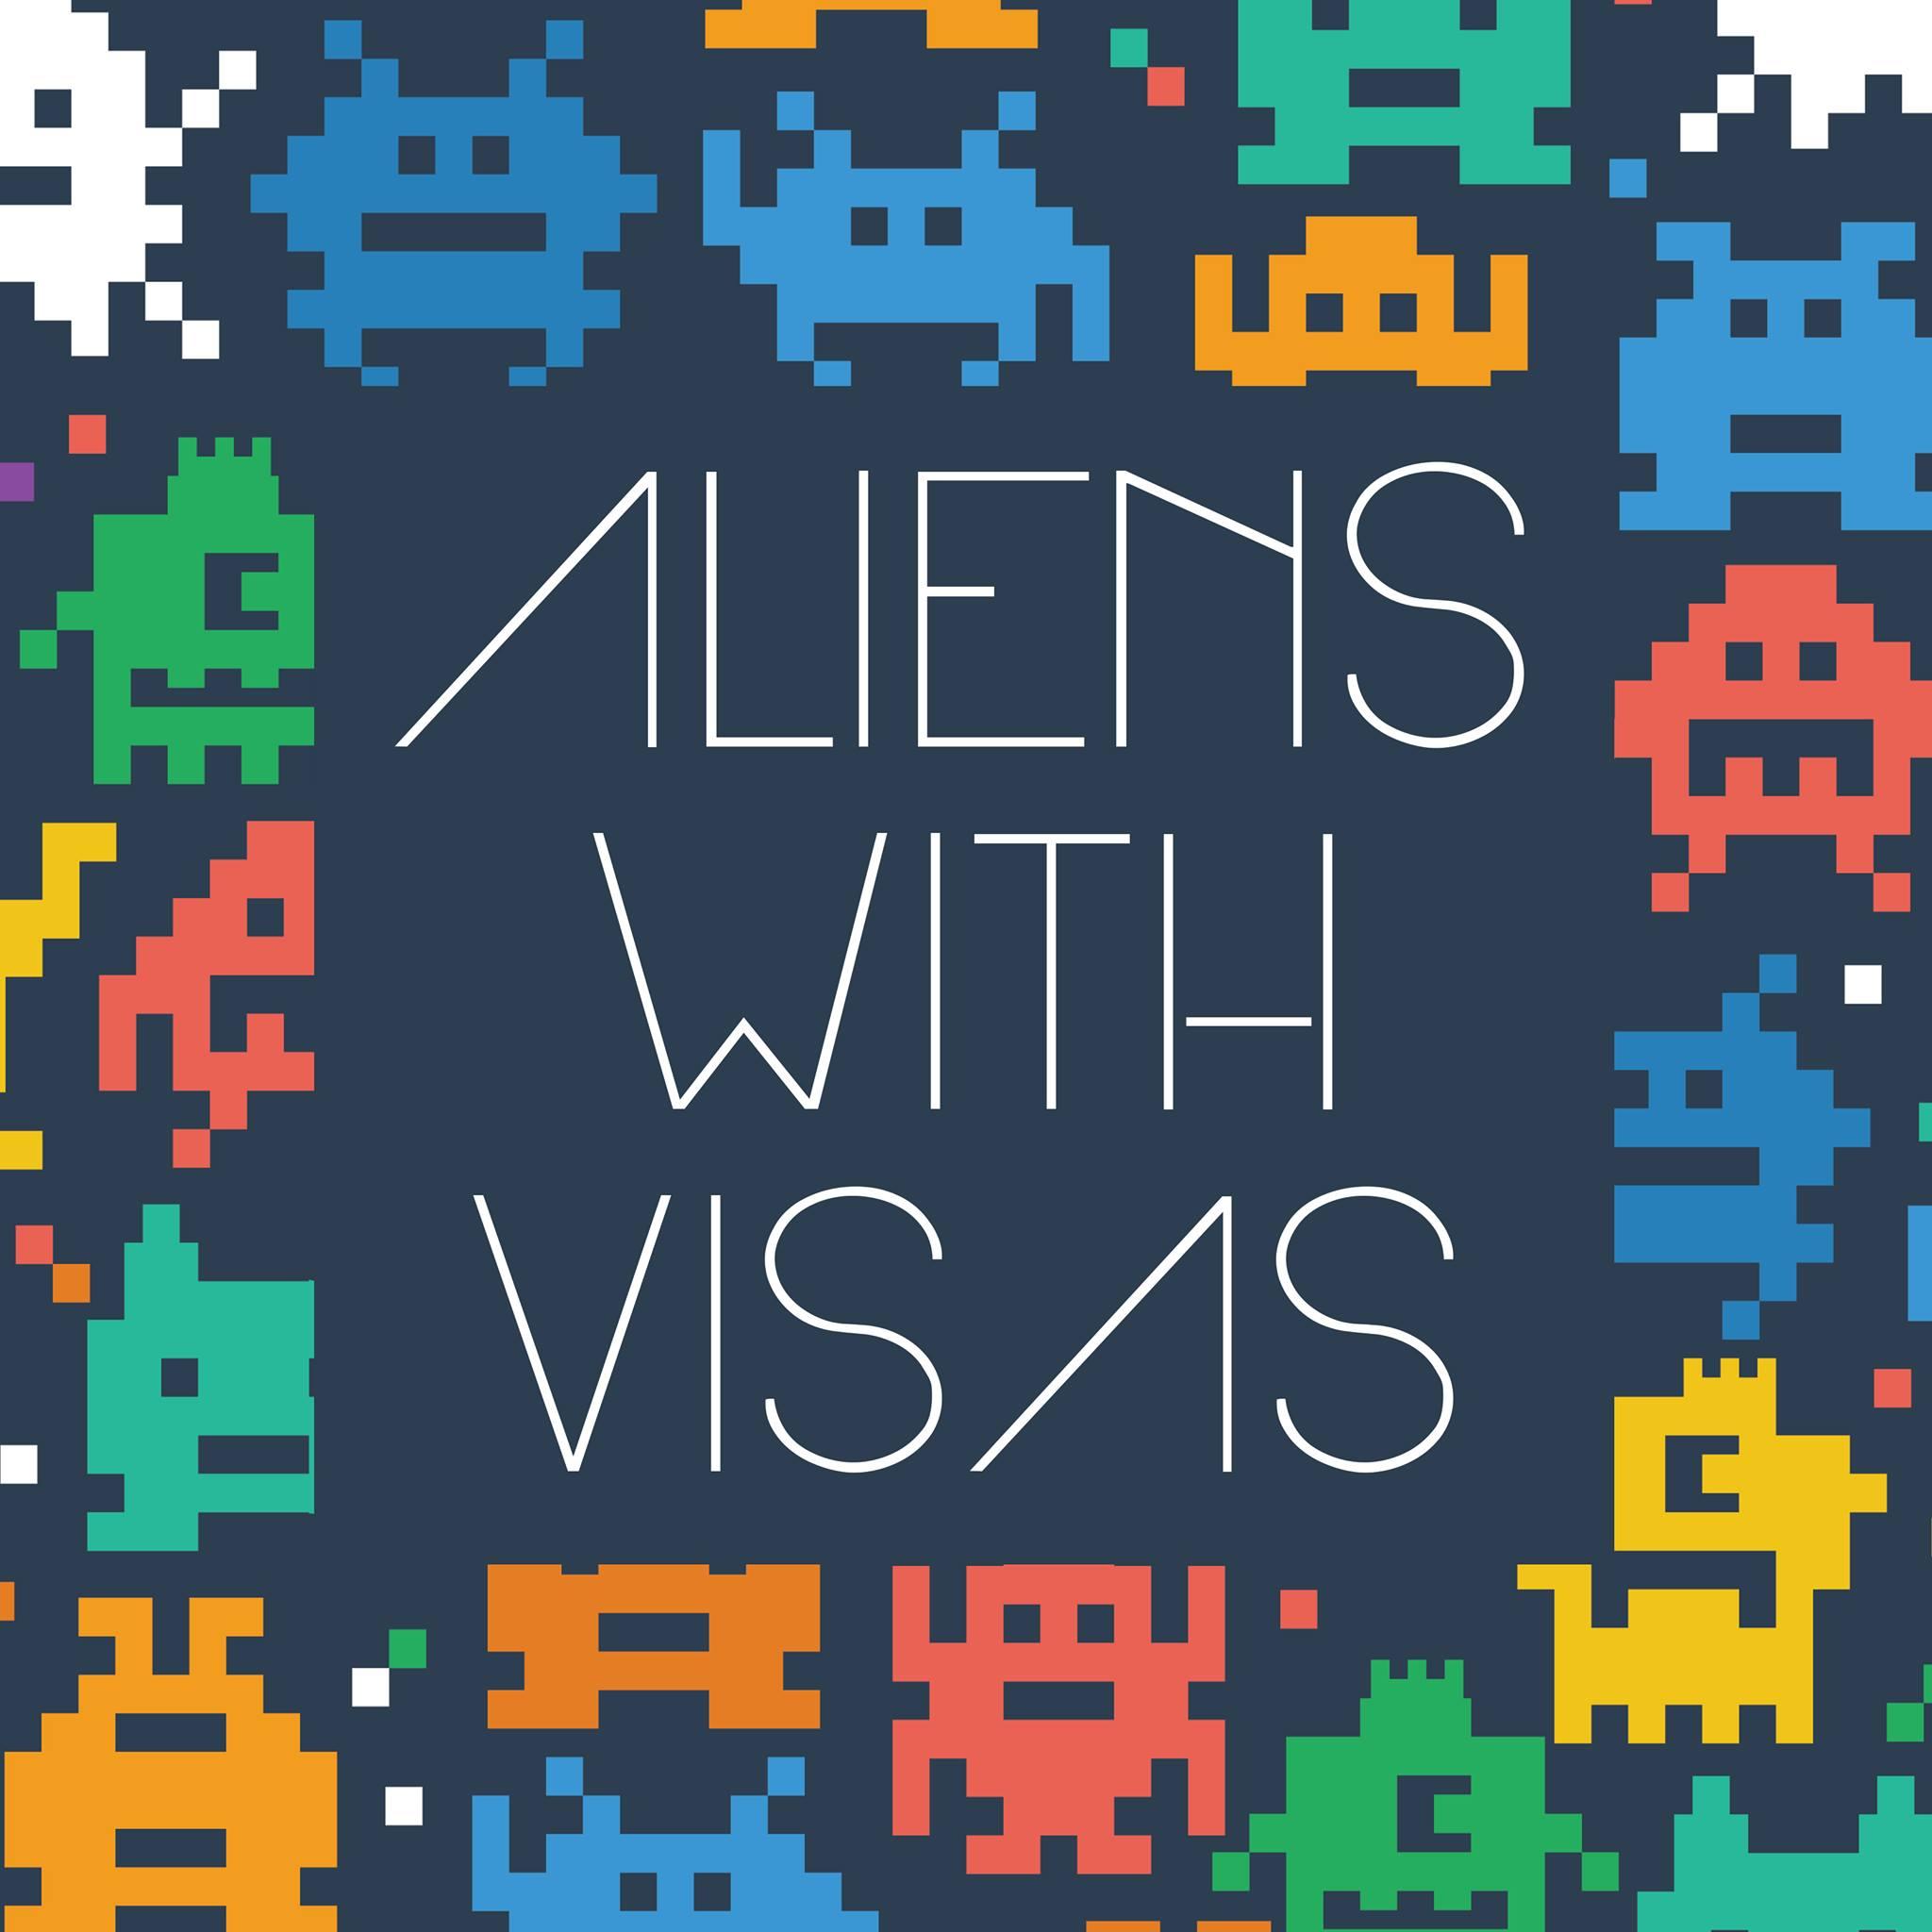 AlienswithVisas